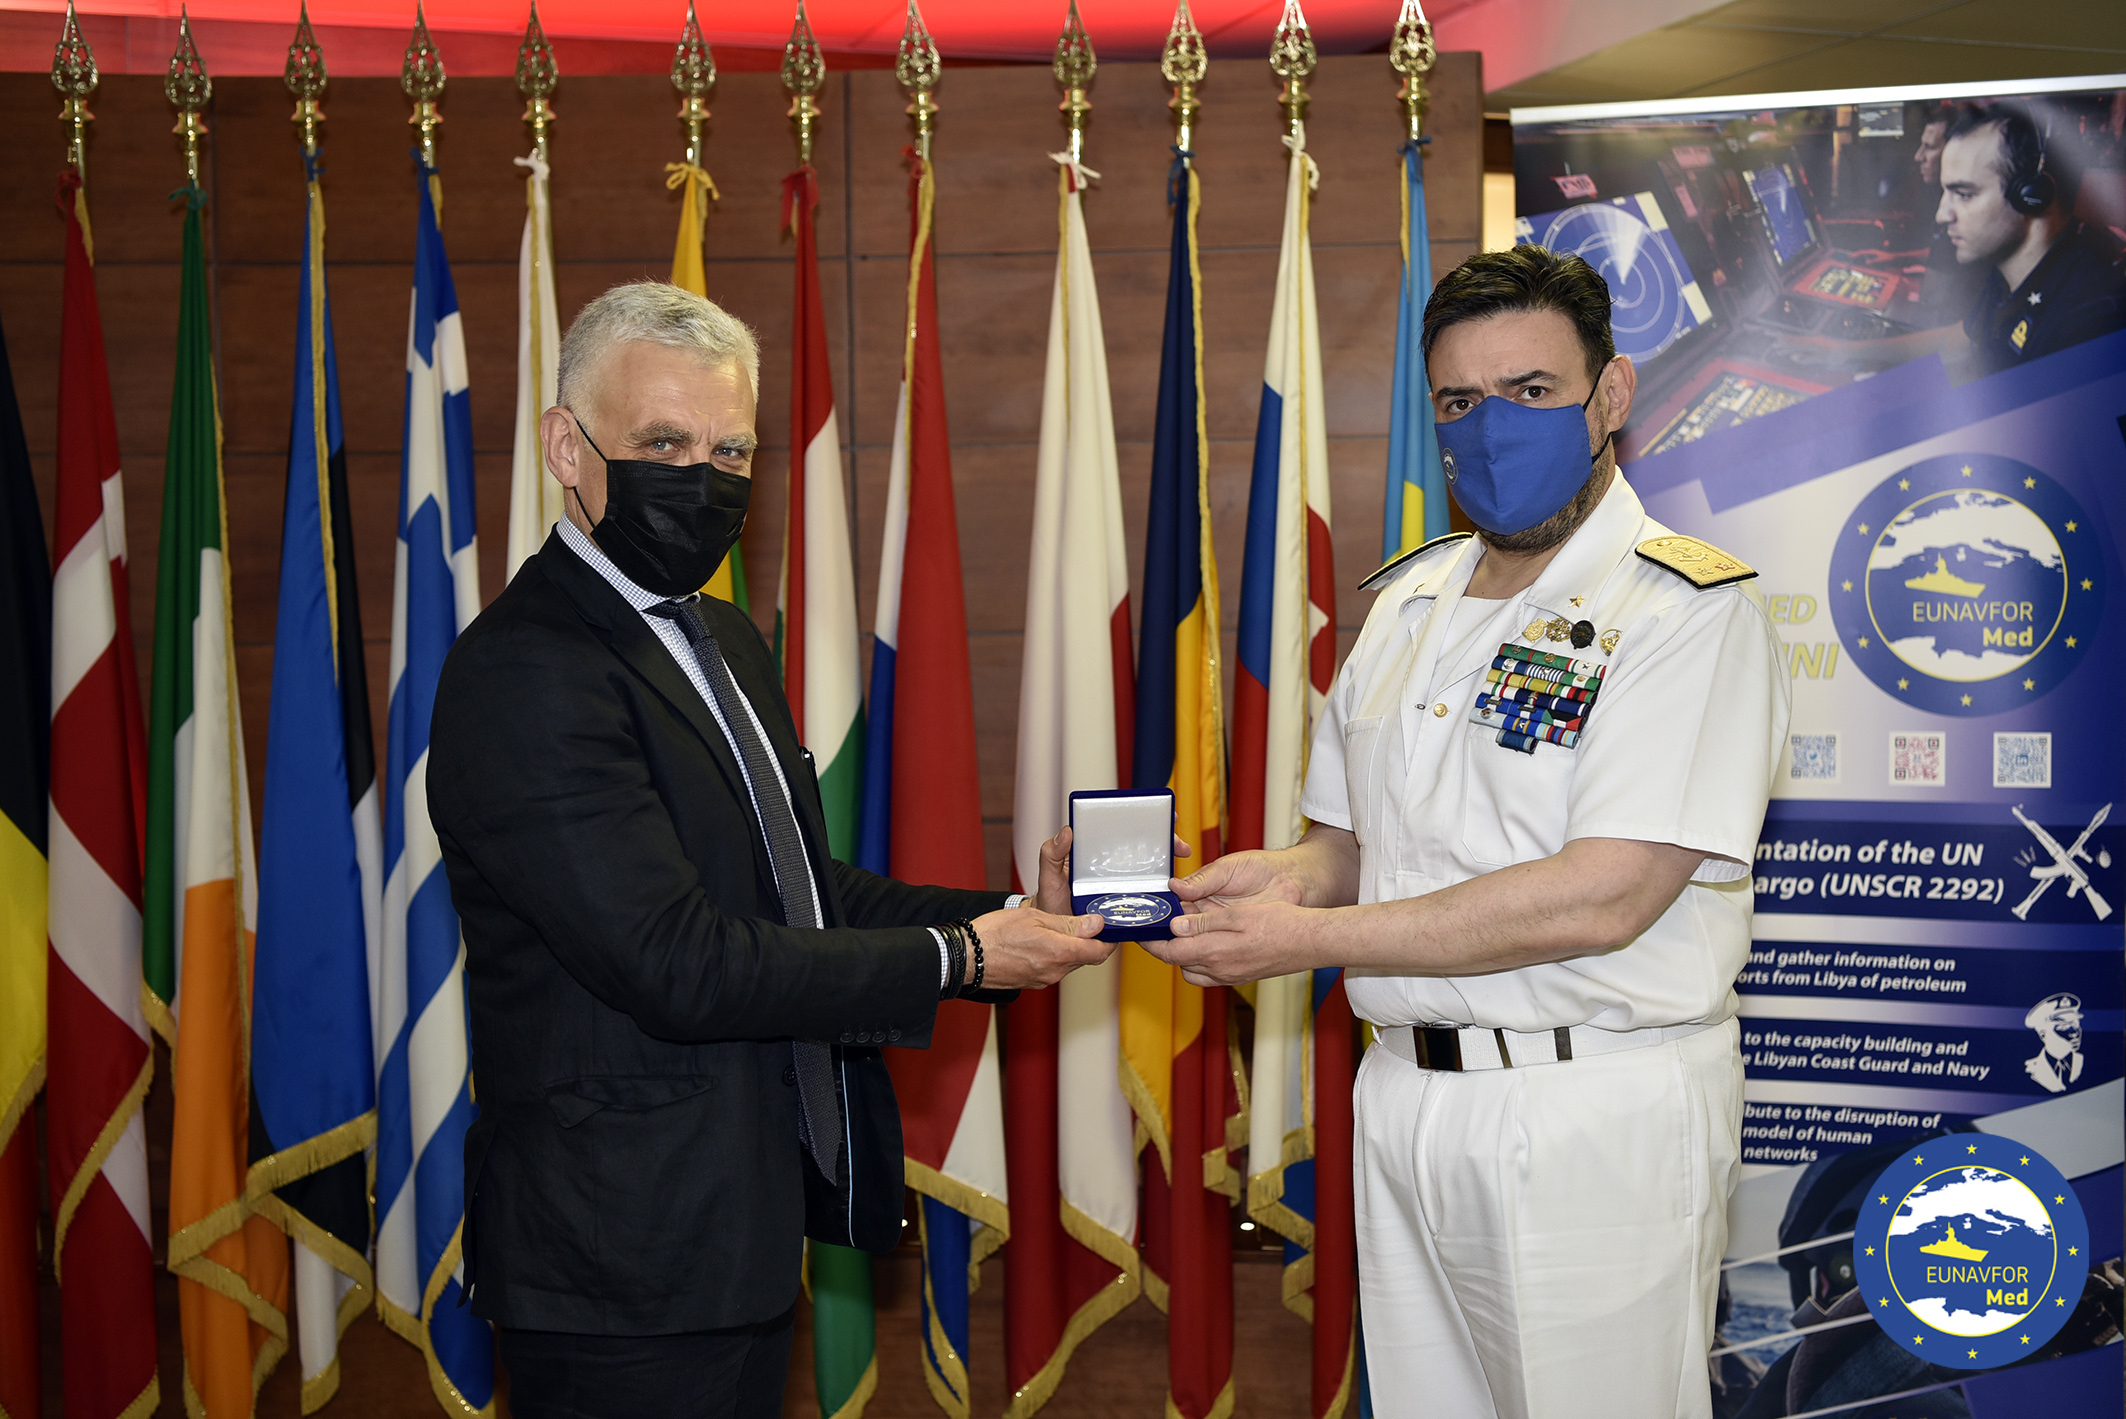 The Acting Director General for European Neighbourhood and Enlargement Negotiations (DG NEAR) Mr. Maciej POPOWSKI visited Irini's headquarters